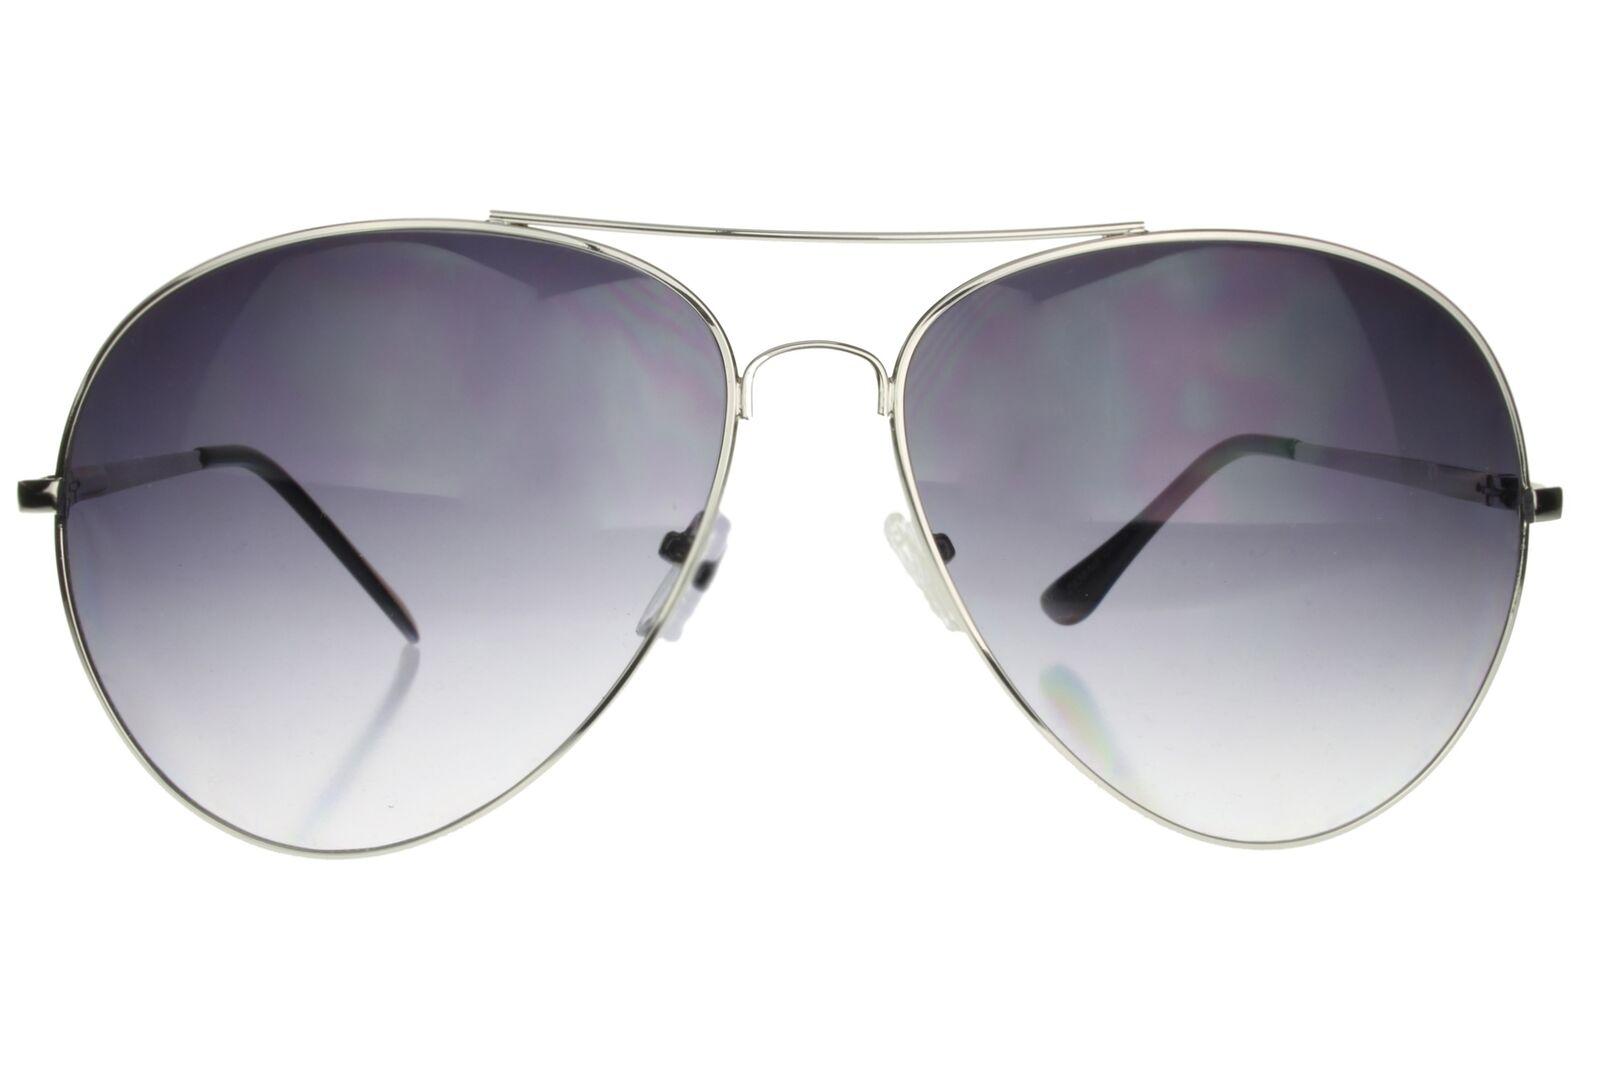 Aviator Sunglasses Extra Wide Frame 160mm XXL Large Oversize